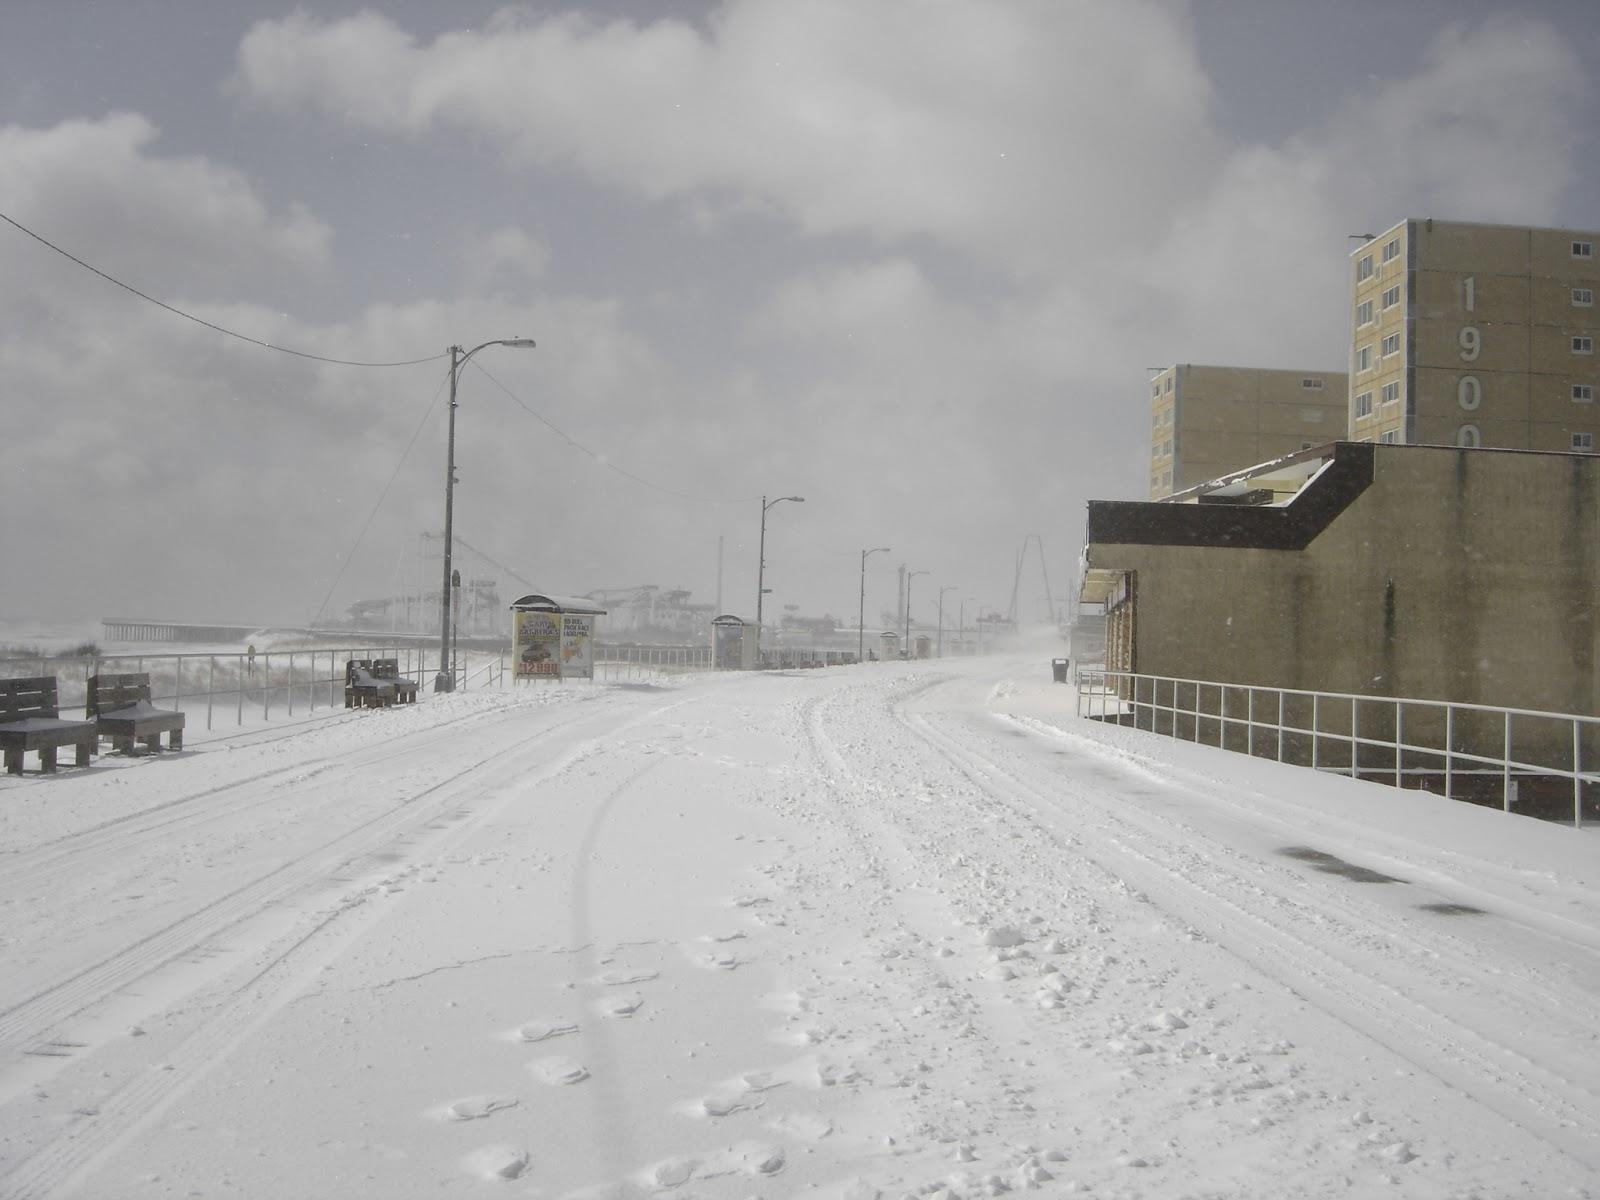 Wildwood Weather Saturday Snow Storm